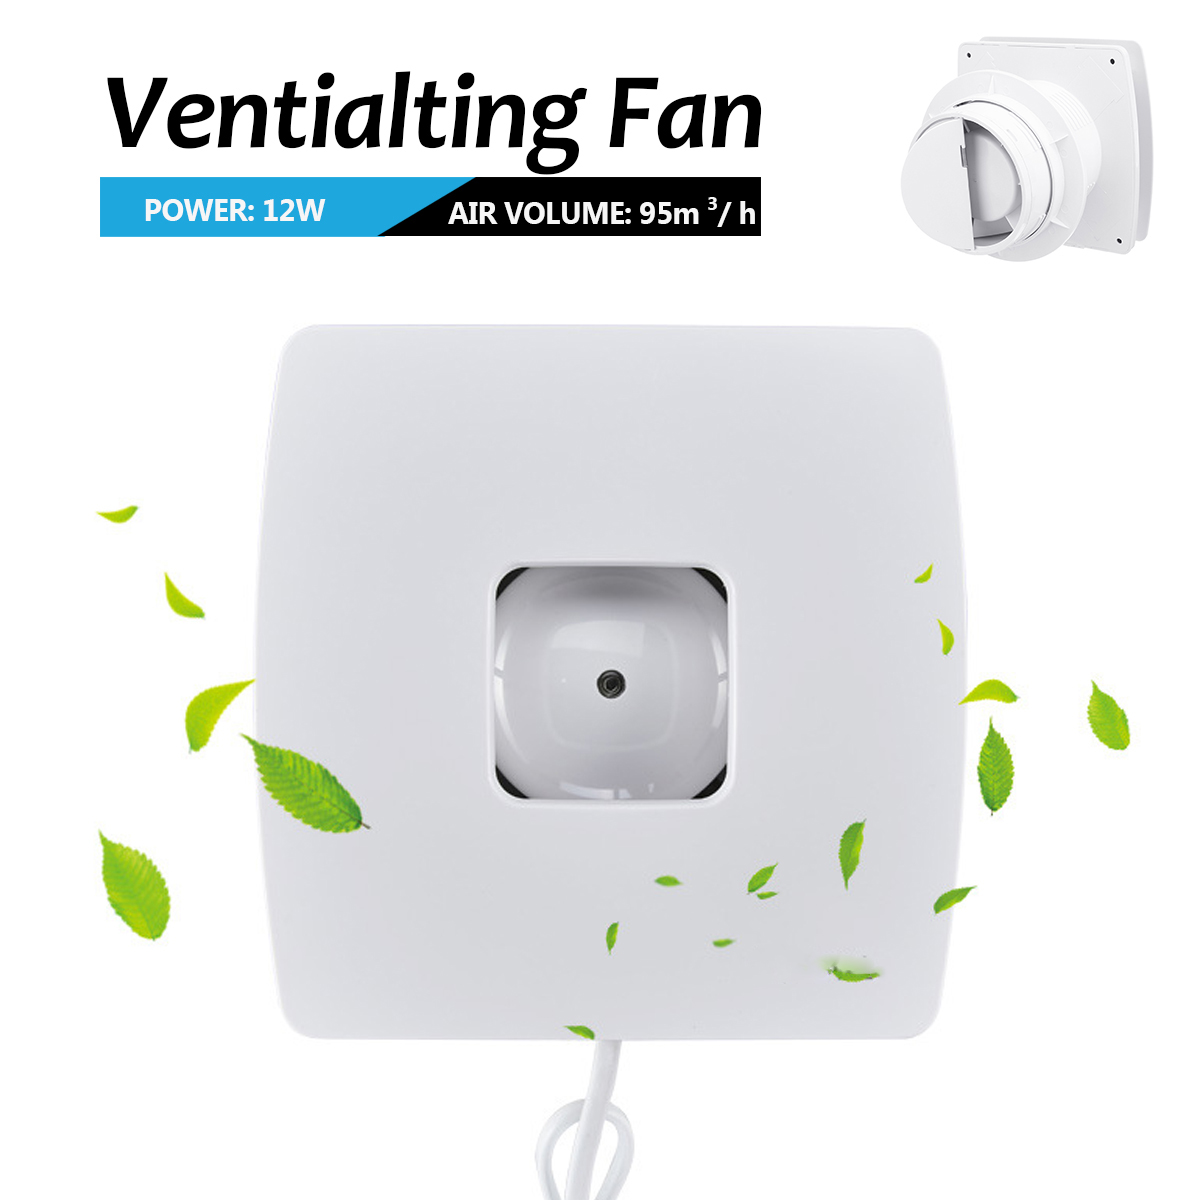 Quiet Plafond Ventilator 220V High Speed Ventilation Fan 4'' Air Blower Pipe Extractor Bathroom Kitchen Toilet Wall Exhaust Fan цена